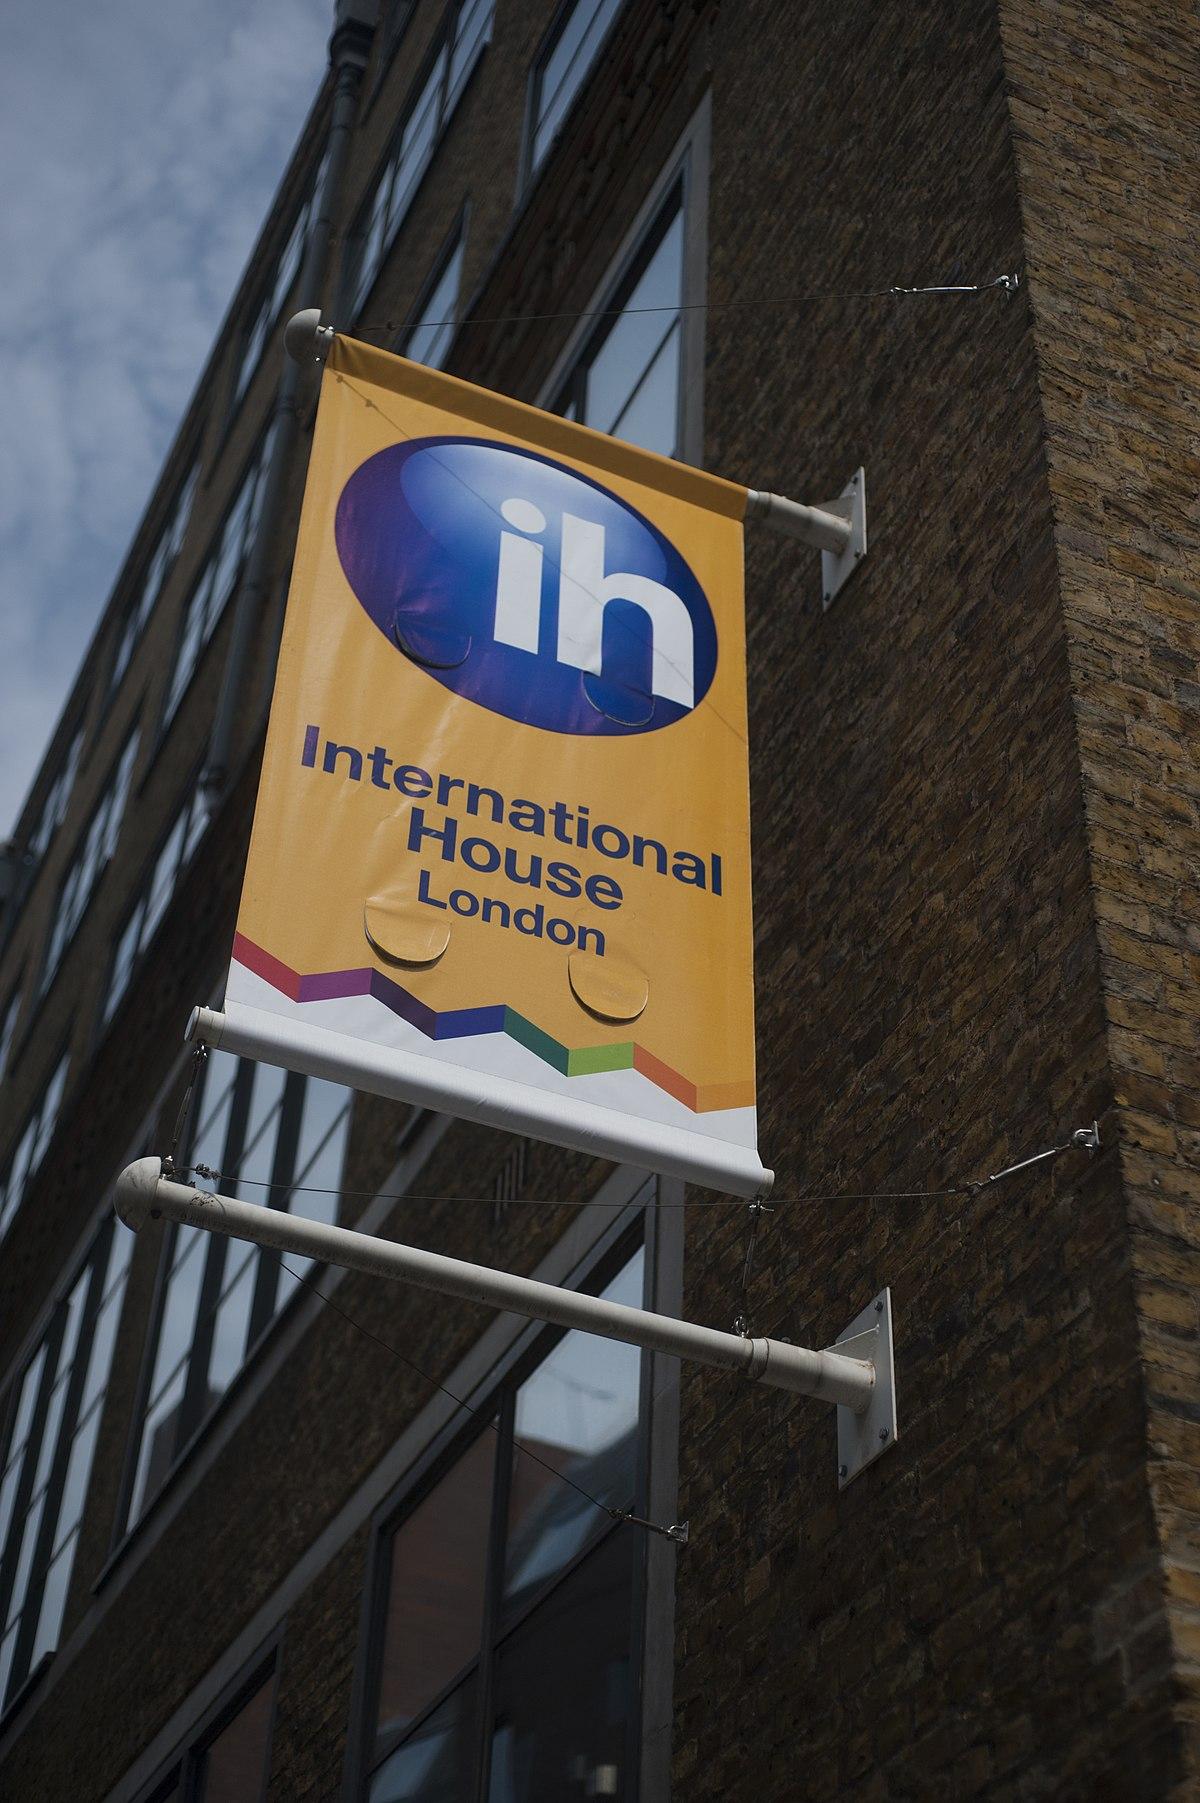 International house london wikipedia for International housse